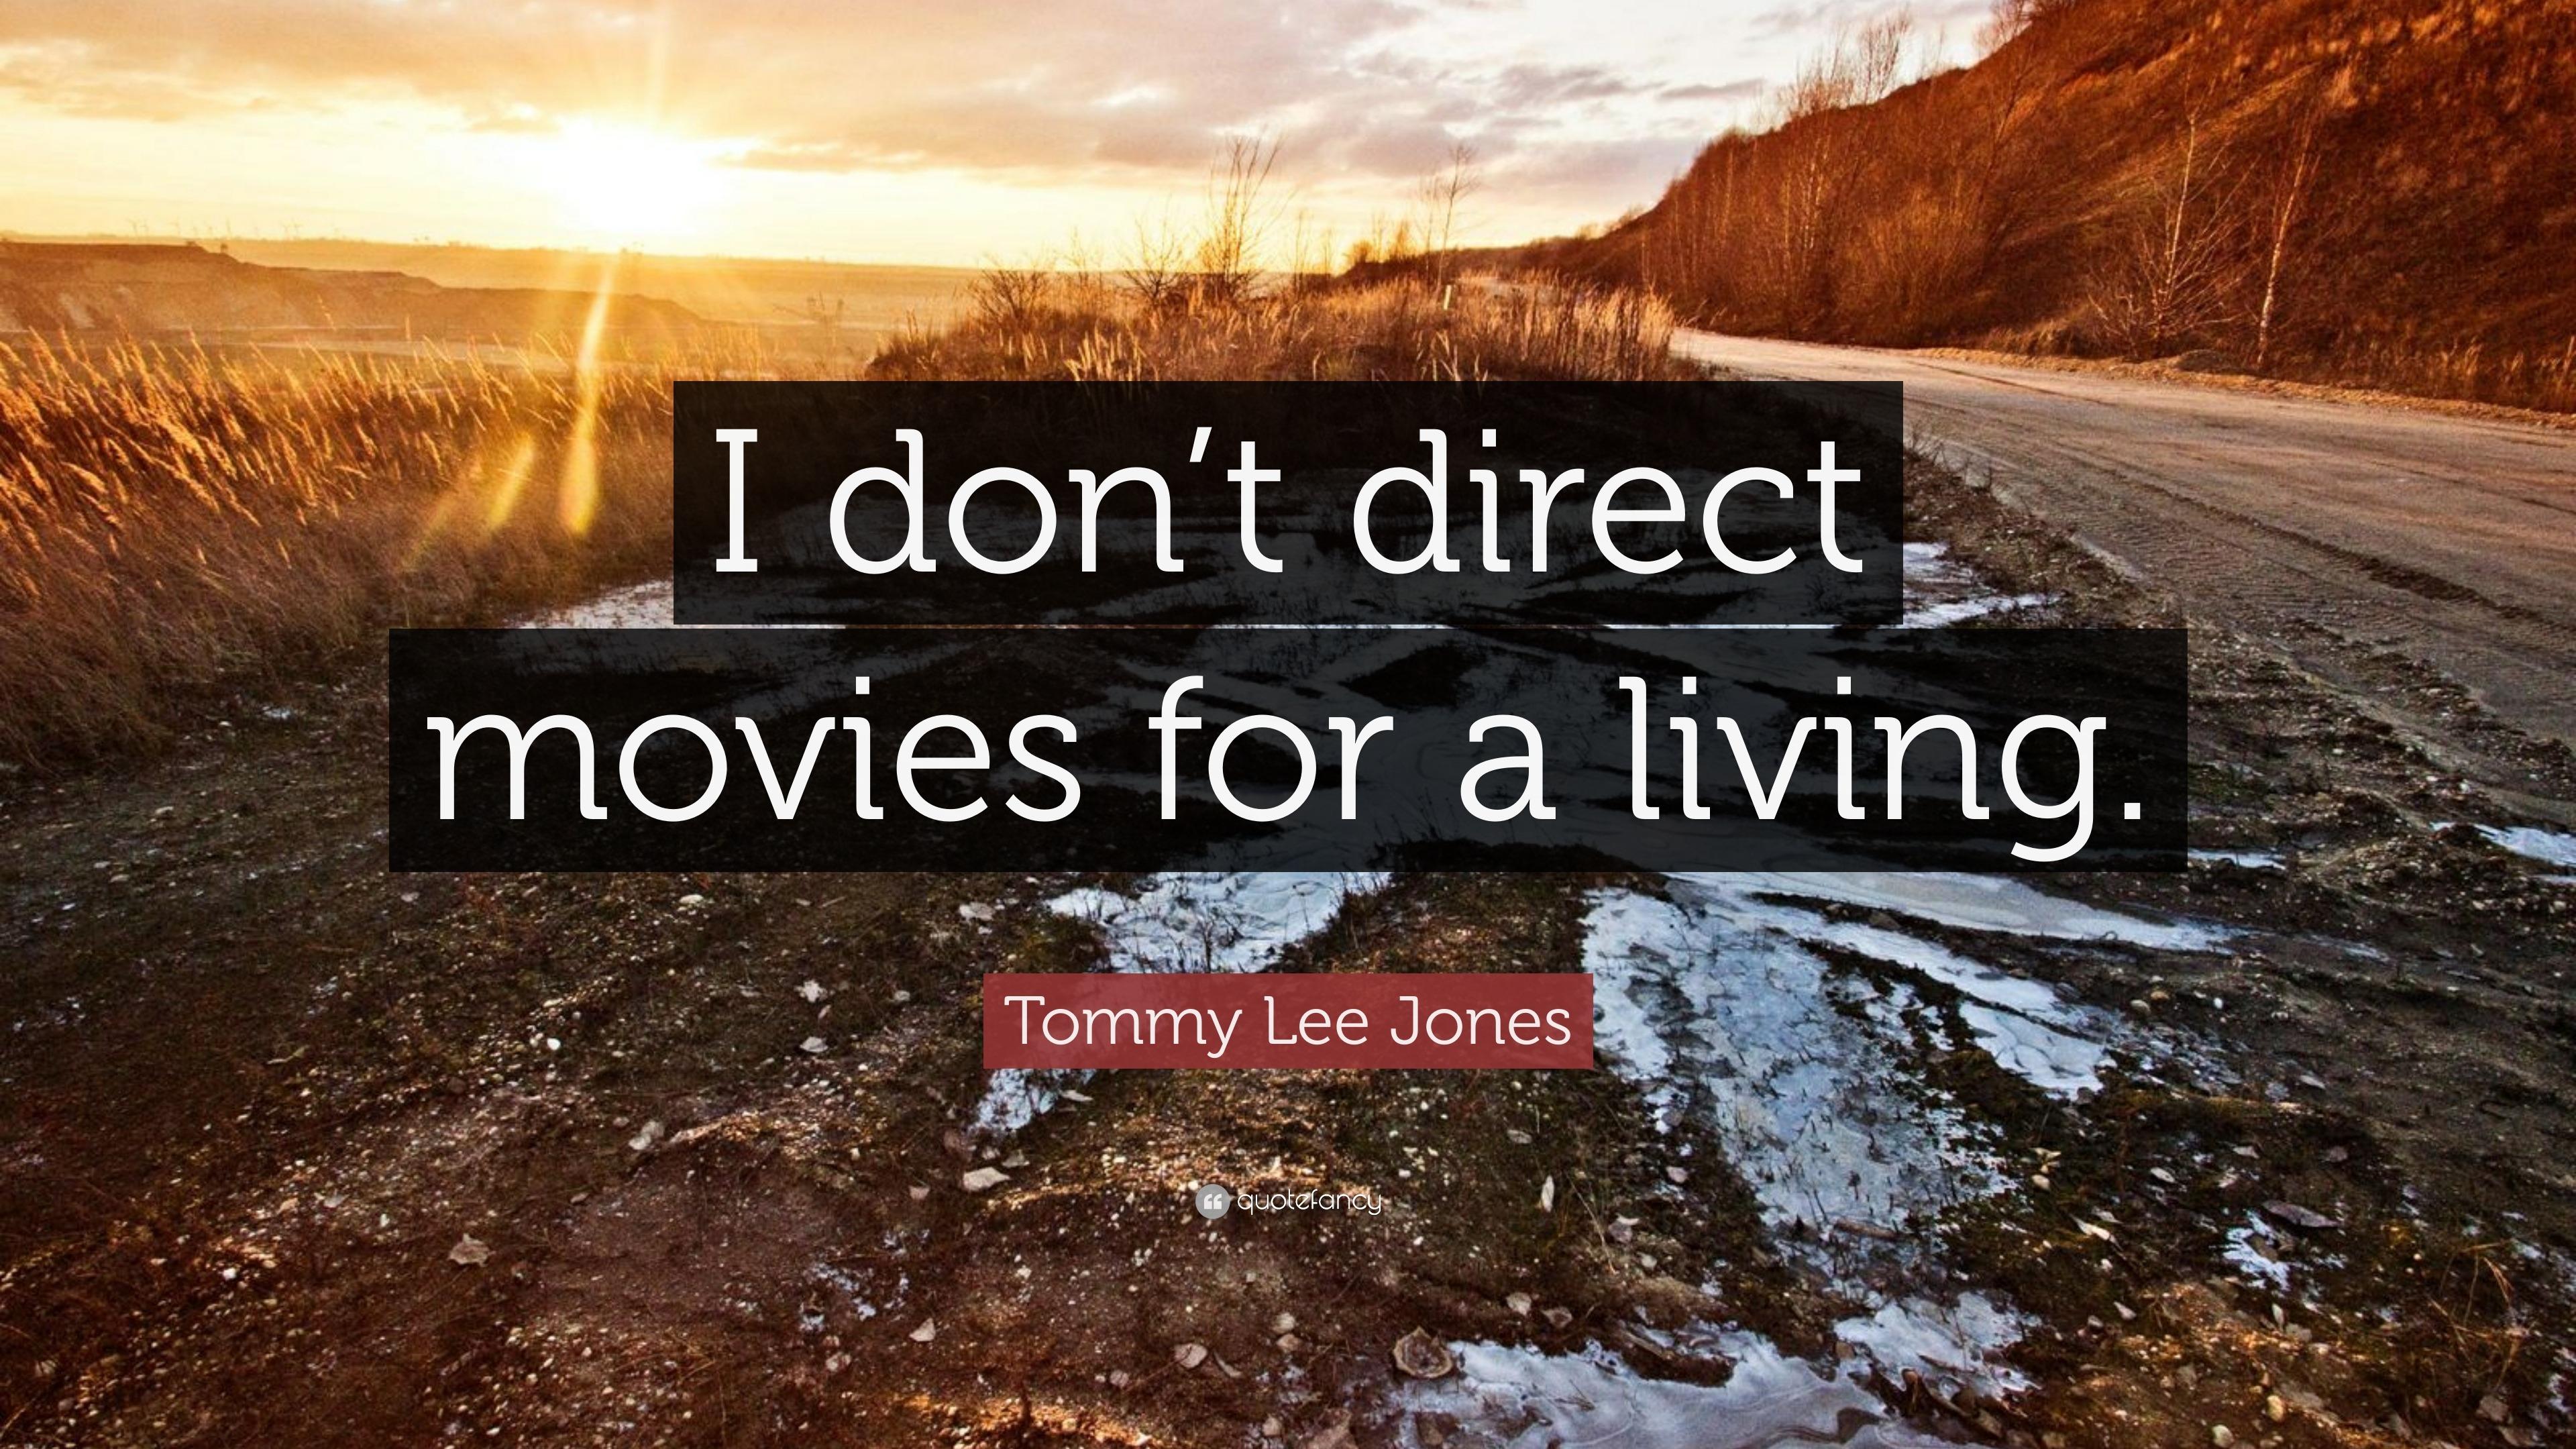 Tommy Lee Jones Quotes (42 wallpapers) - Quotefancy | 3840 x 2160 jpeg 2255kB